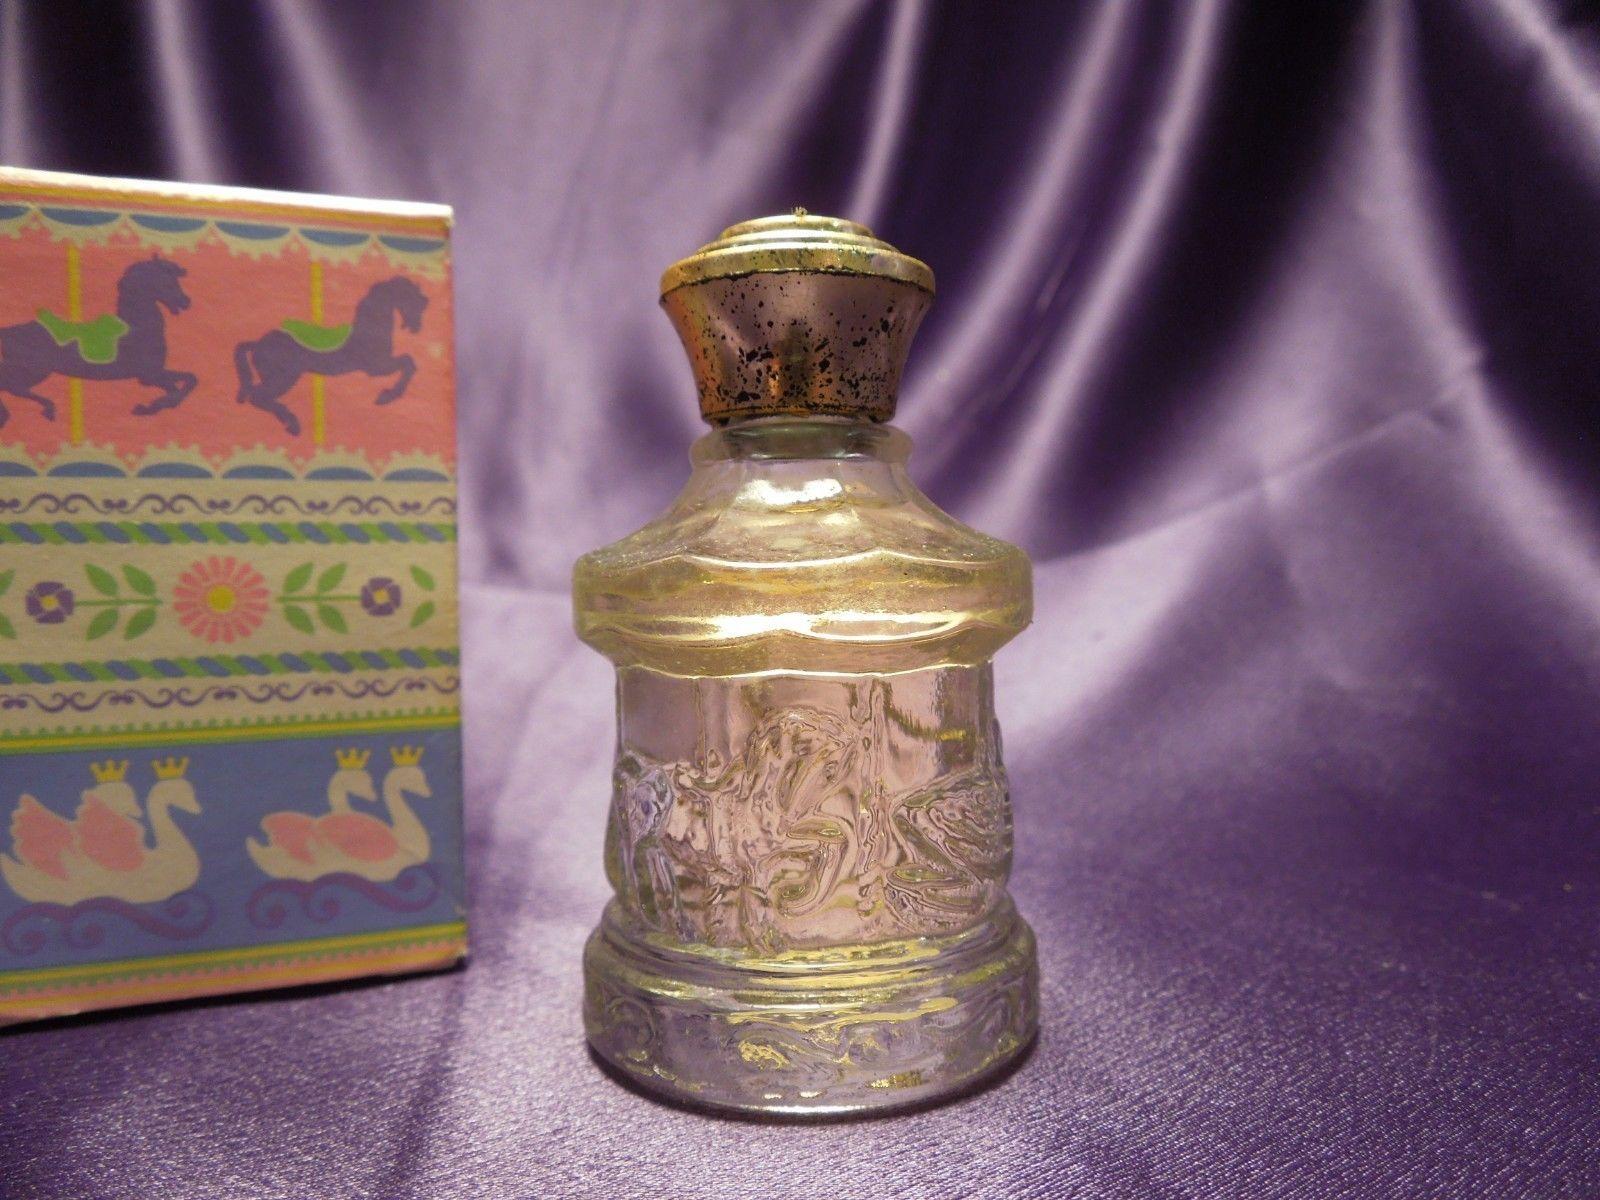 Avon Cologne Go Round Bottle Shape Honeysuckle Cologne .5fl Oz W/ Box